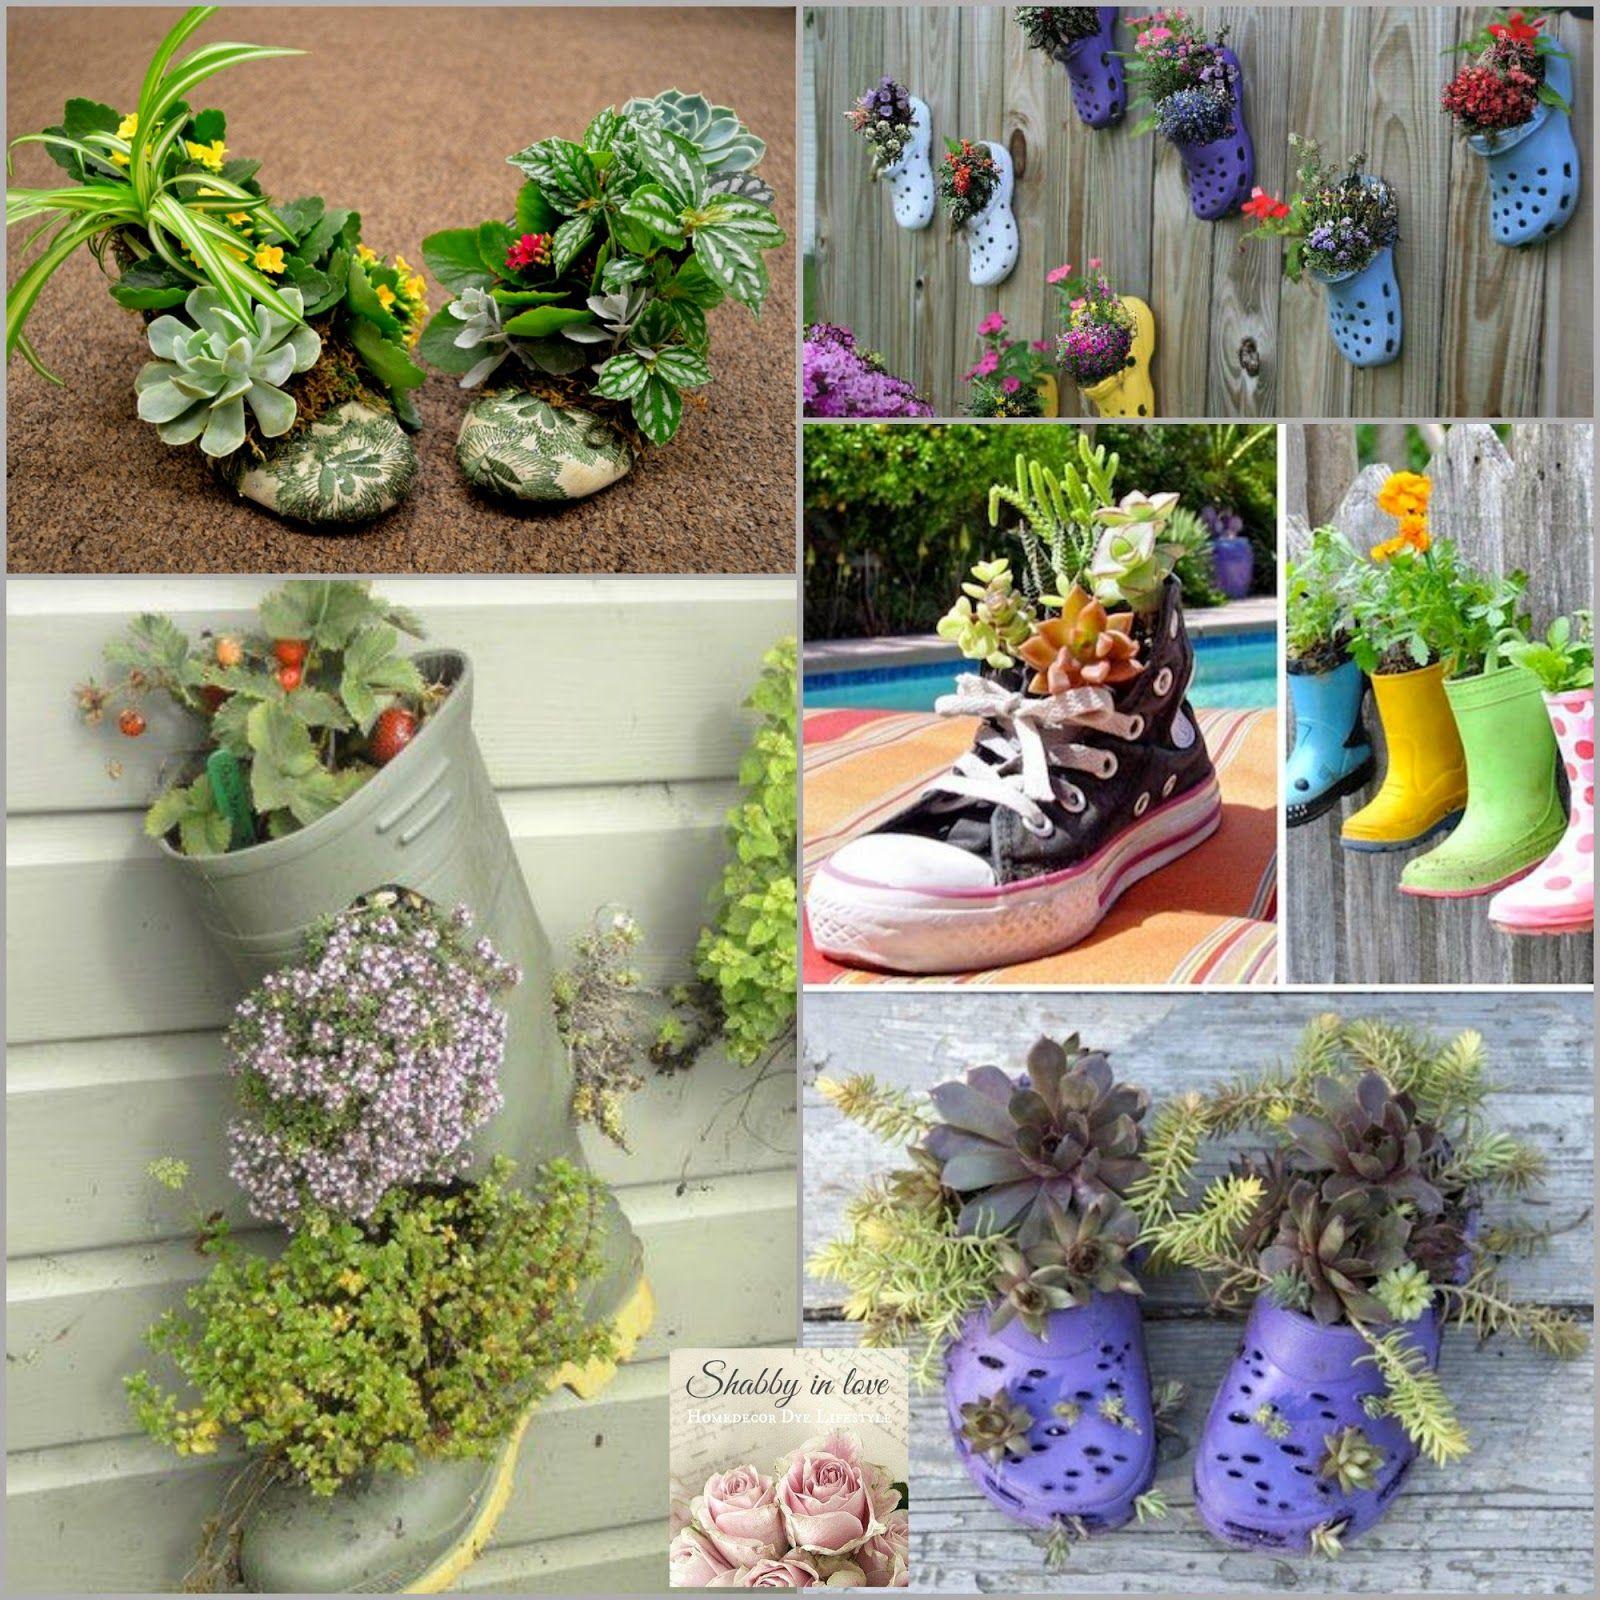 Lovely garden Container ideas   For the Garden   Pinterest   Gardens ...